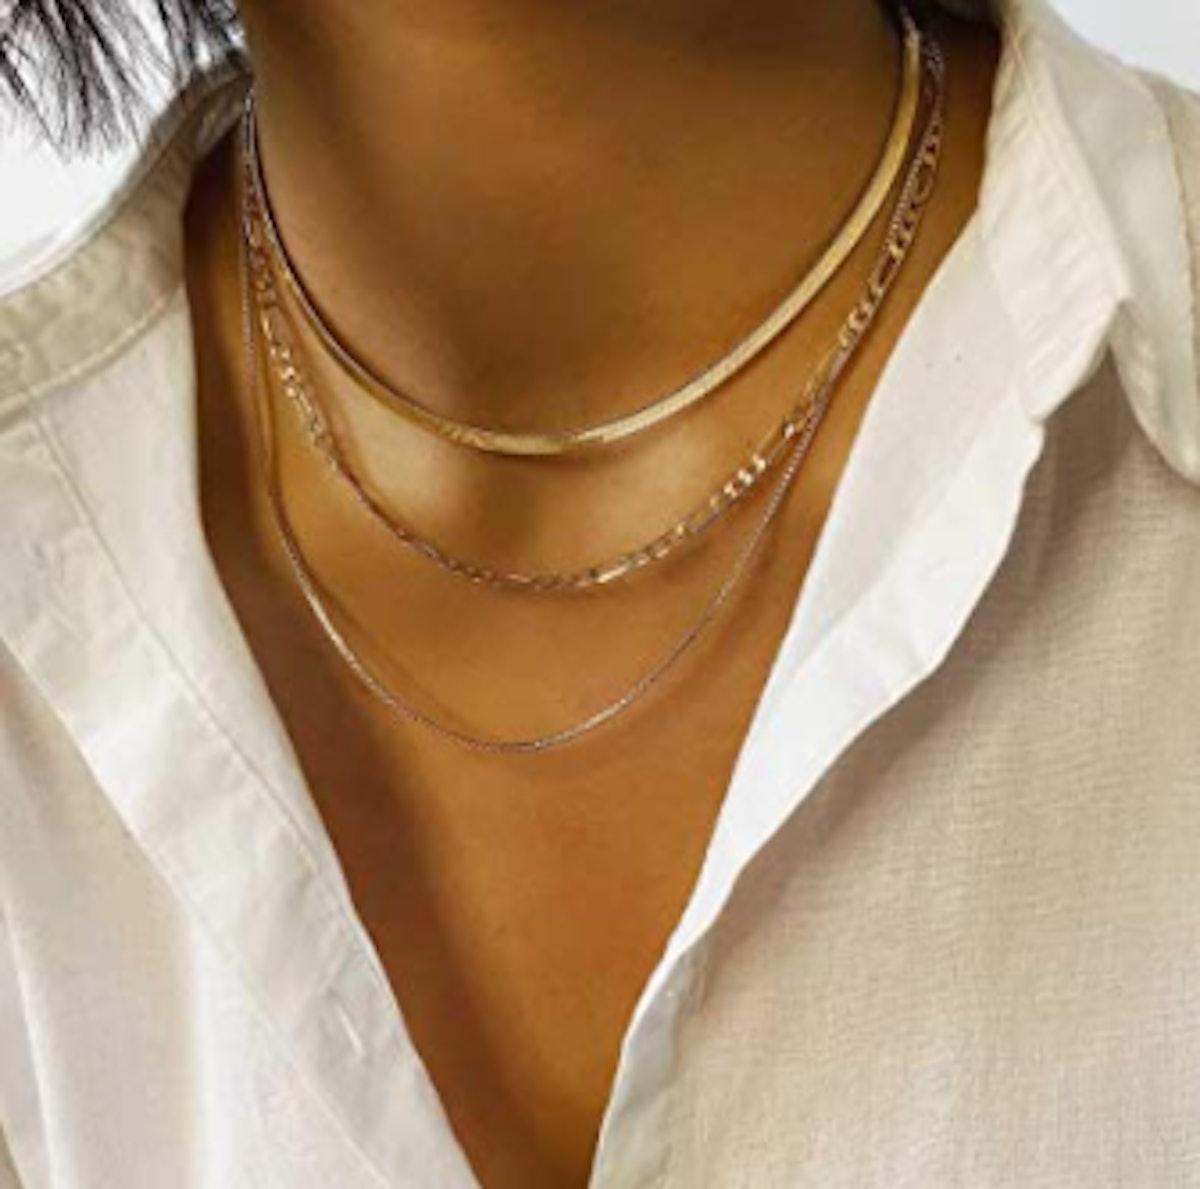 Jeairts Punk Layered Necklace